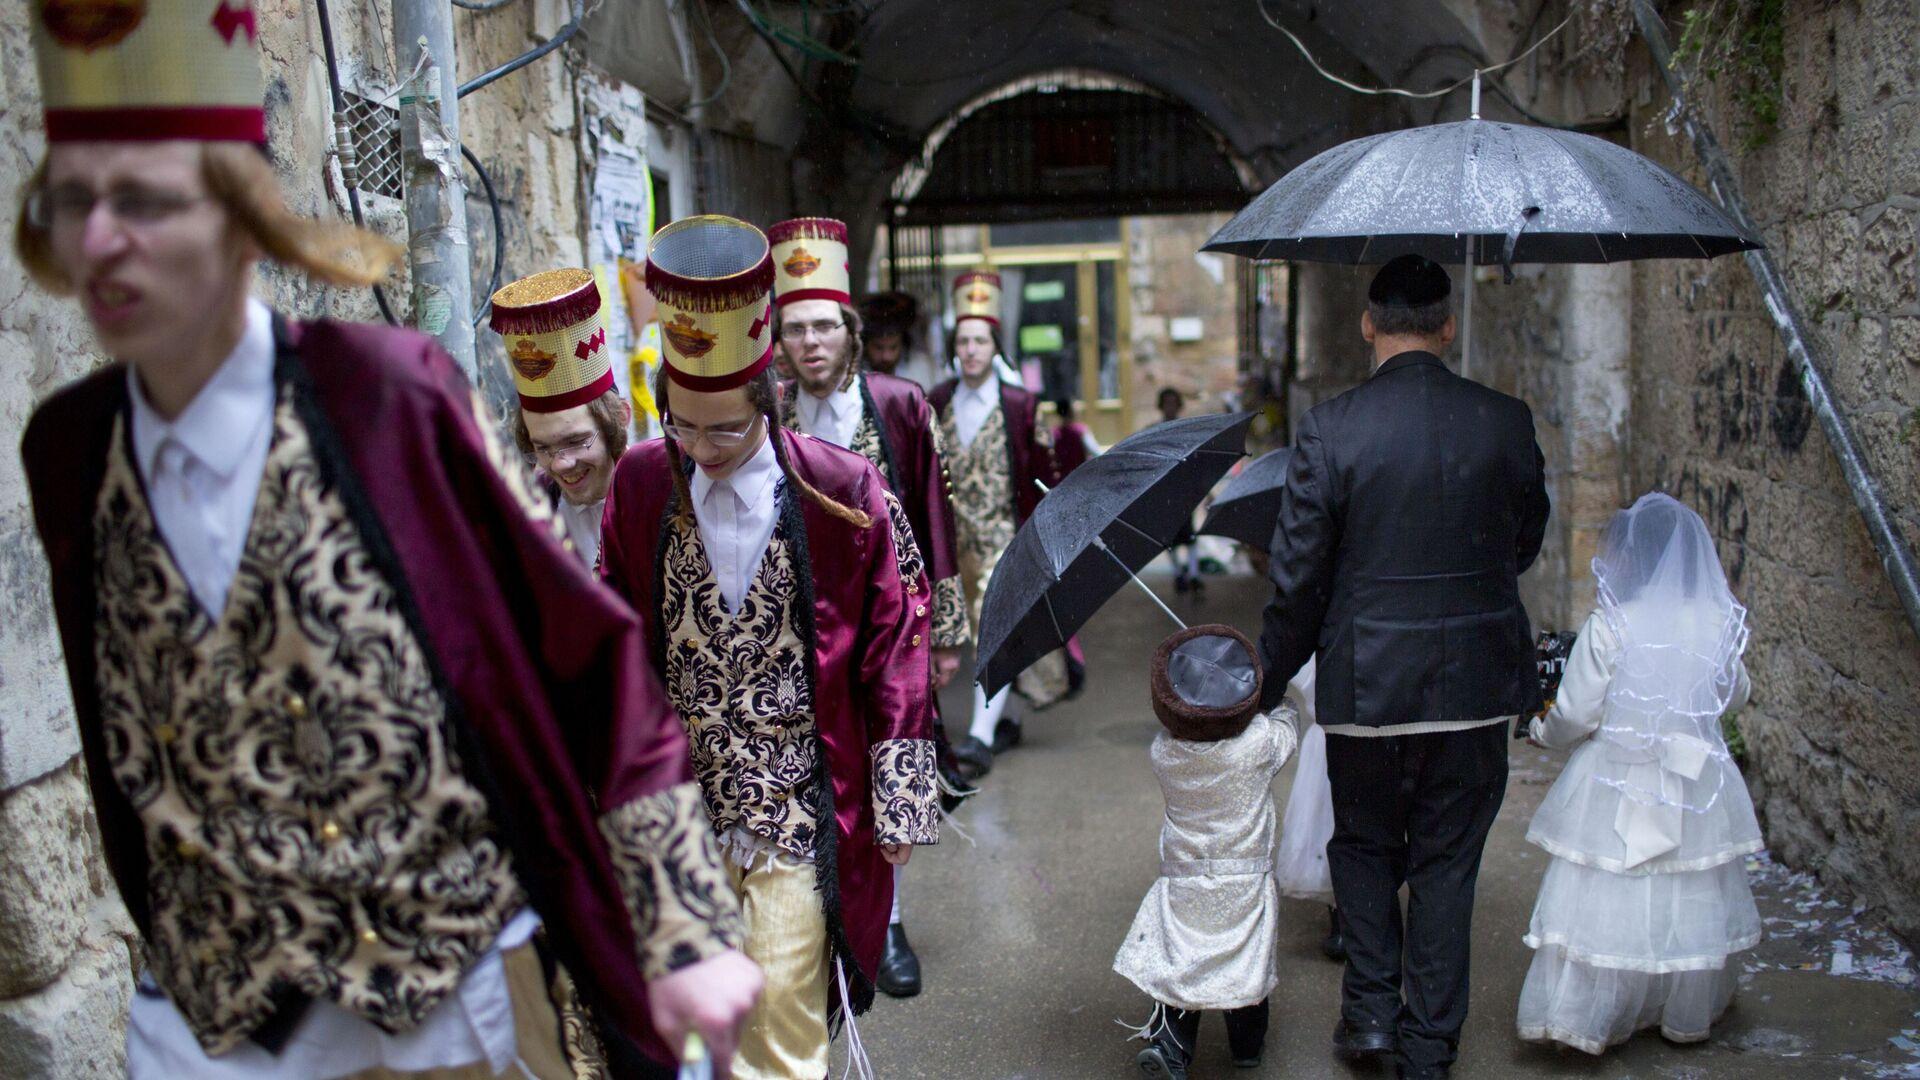 La fiesta de Purim en Jerusalén (archivo) - Sputnik Mundo, 1920, 24.02.2021